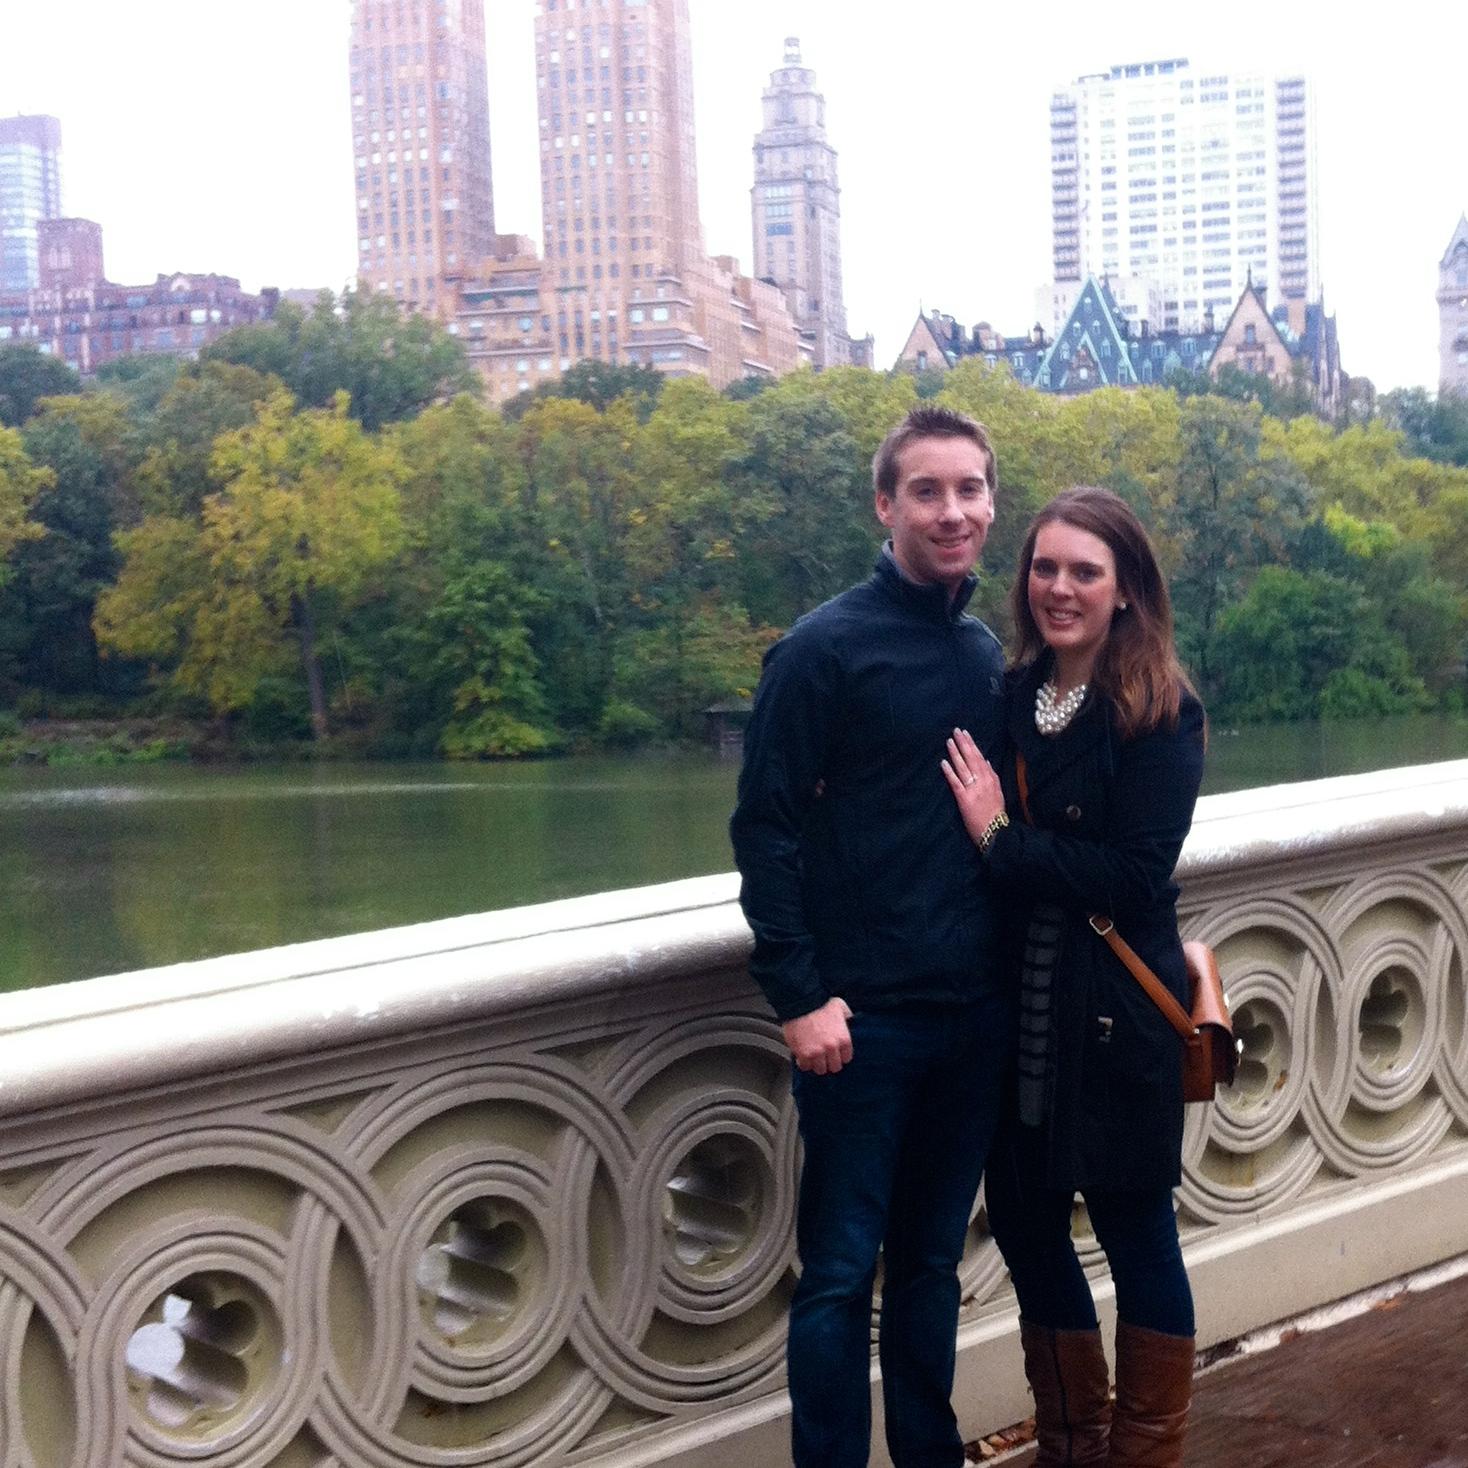 Image 1 of Meg and Kieran